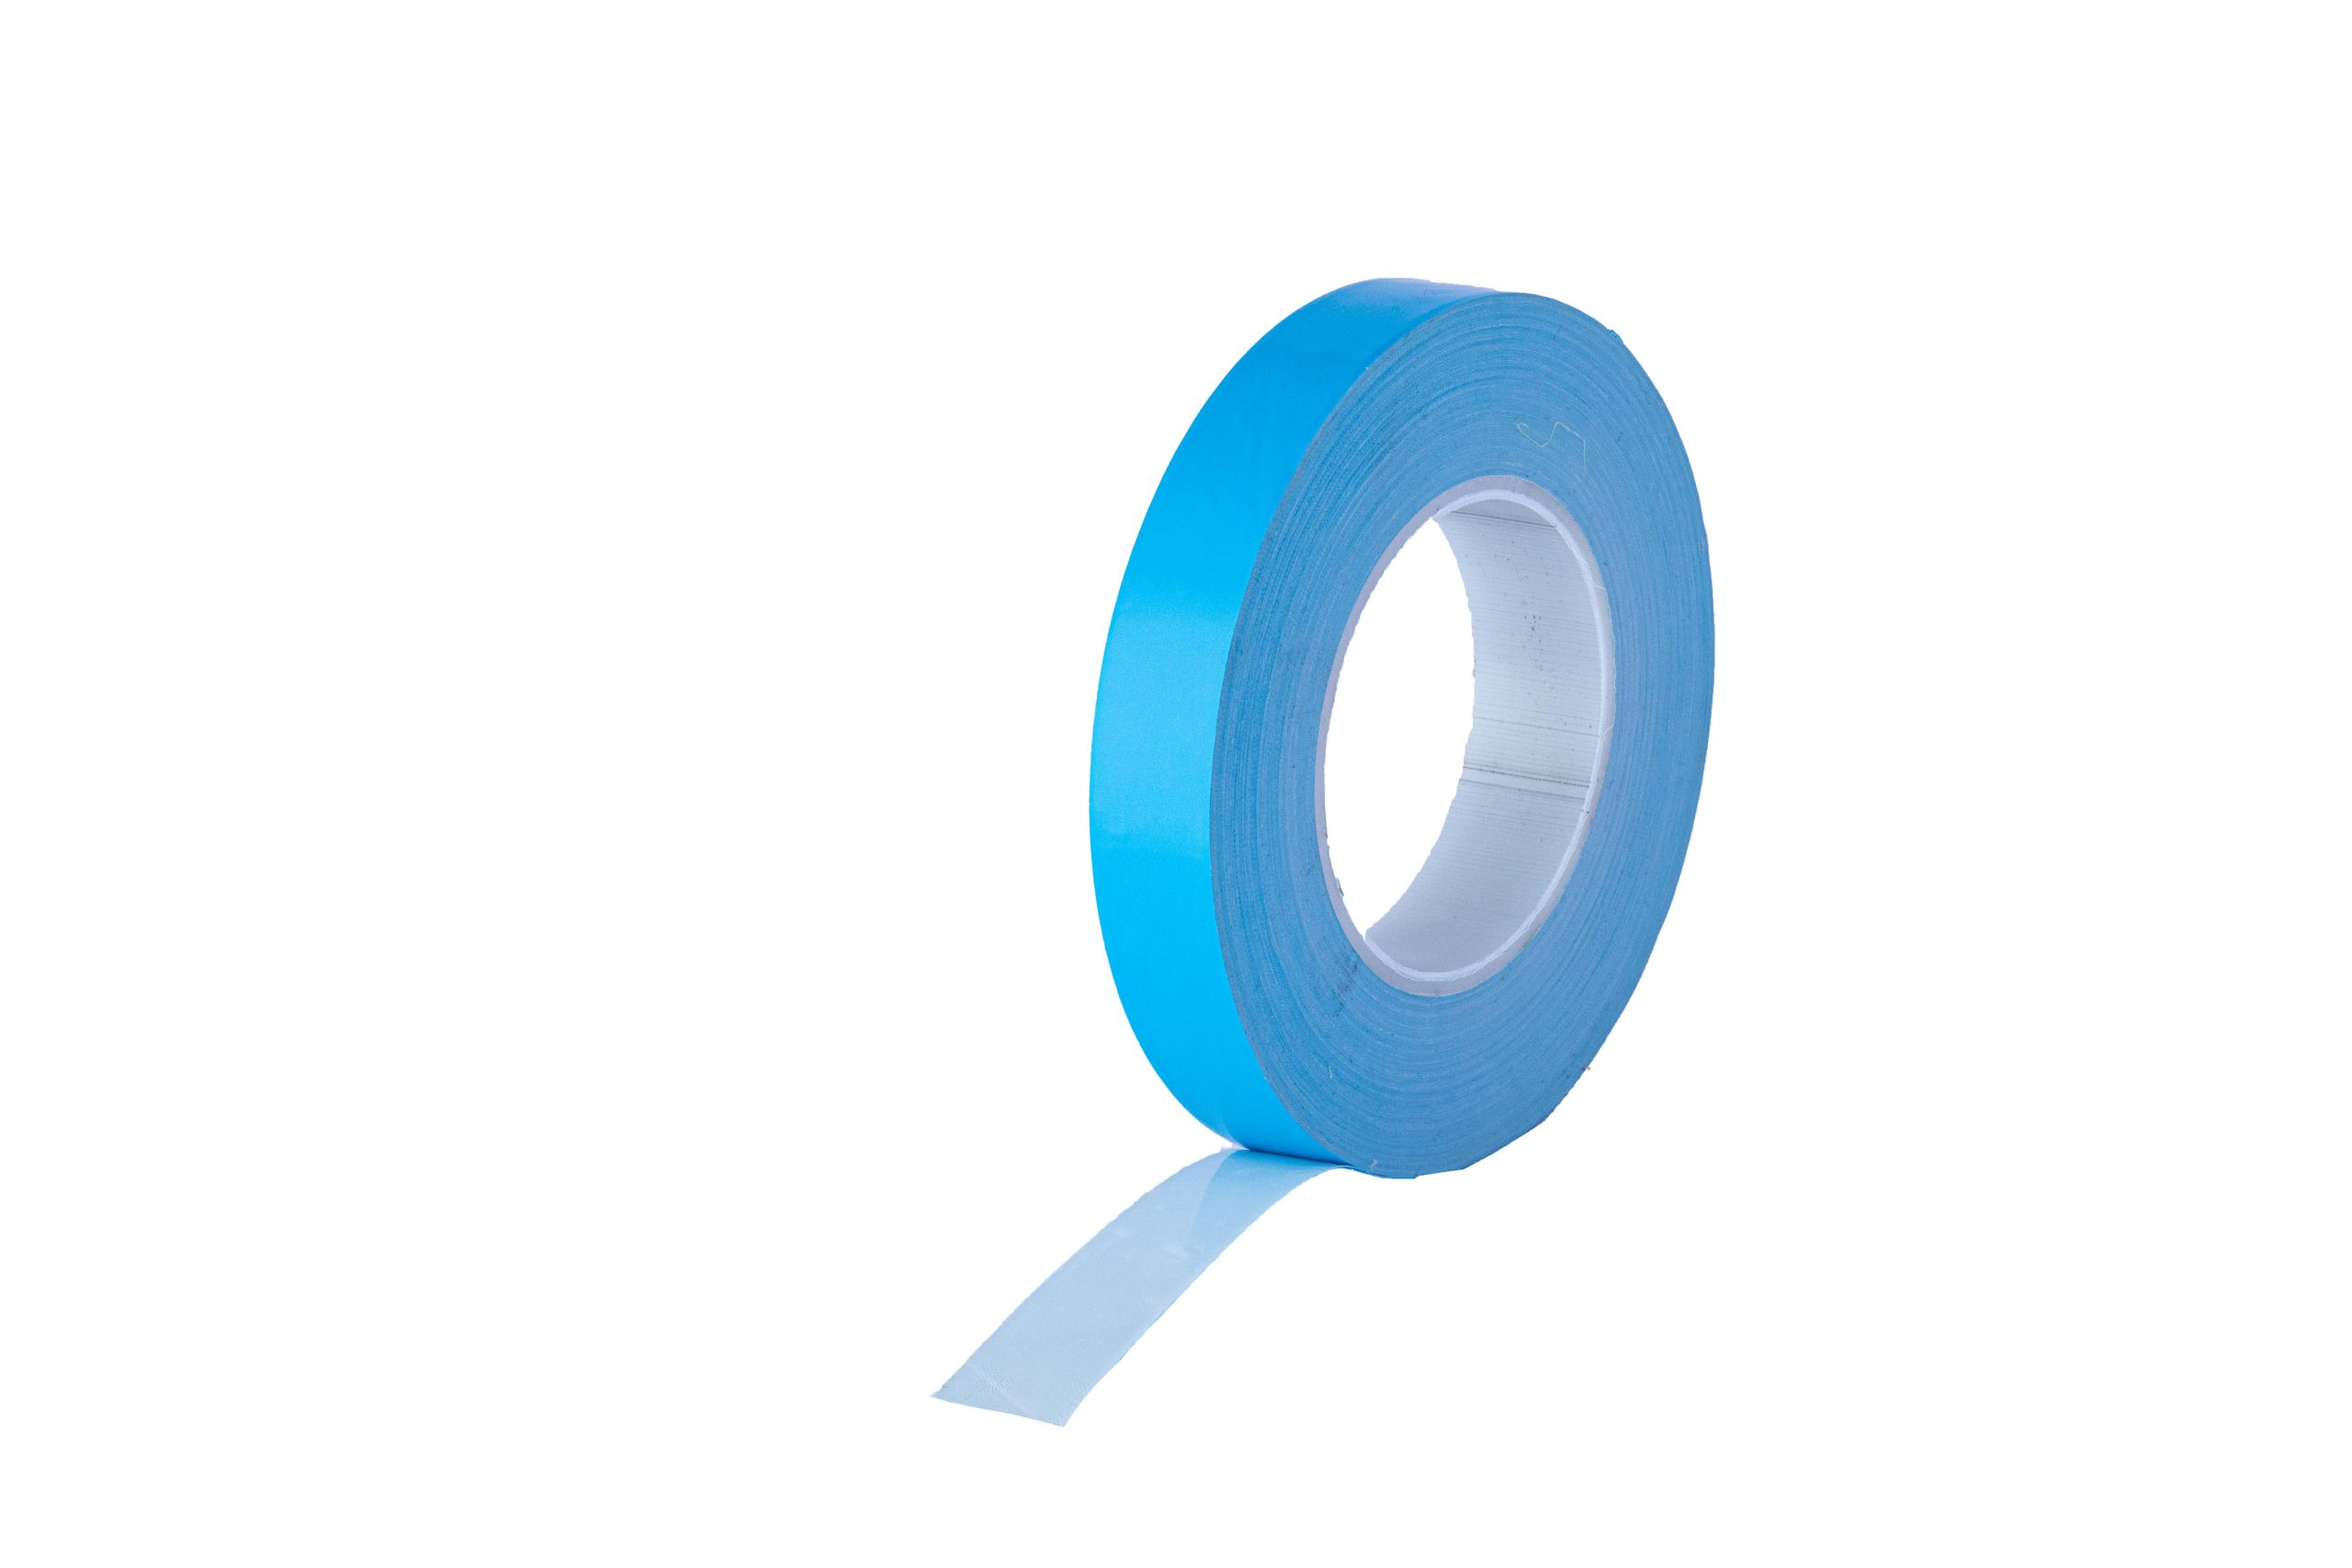 D/s Glass Cloth Tape